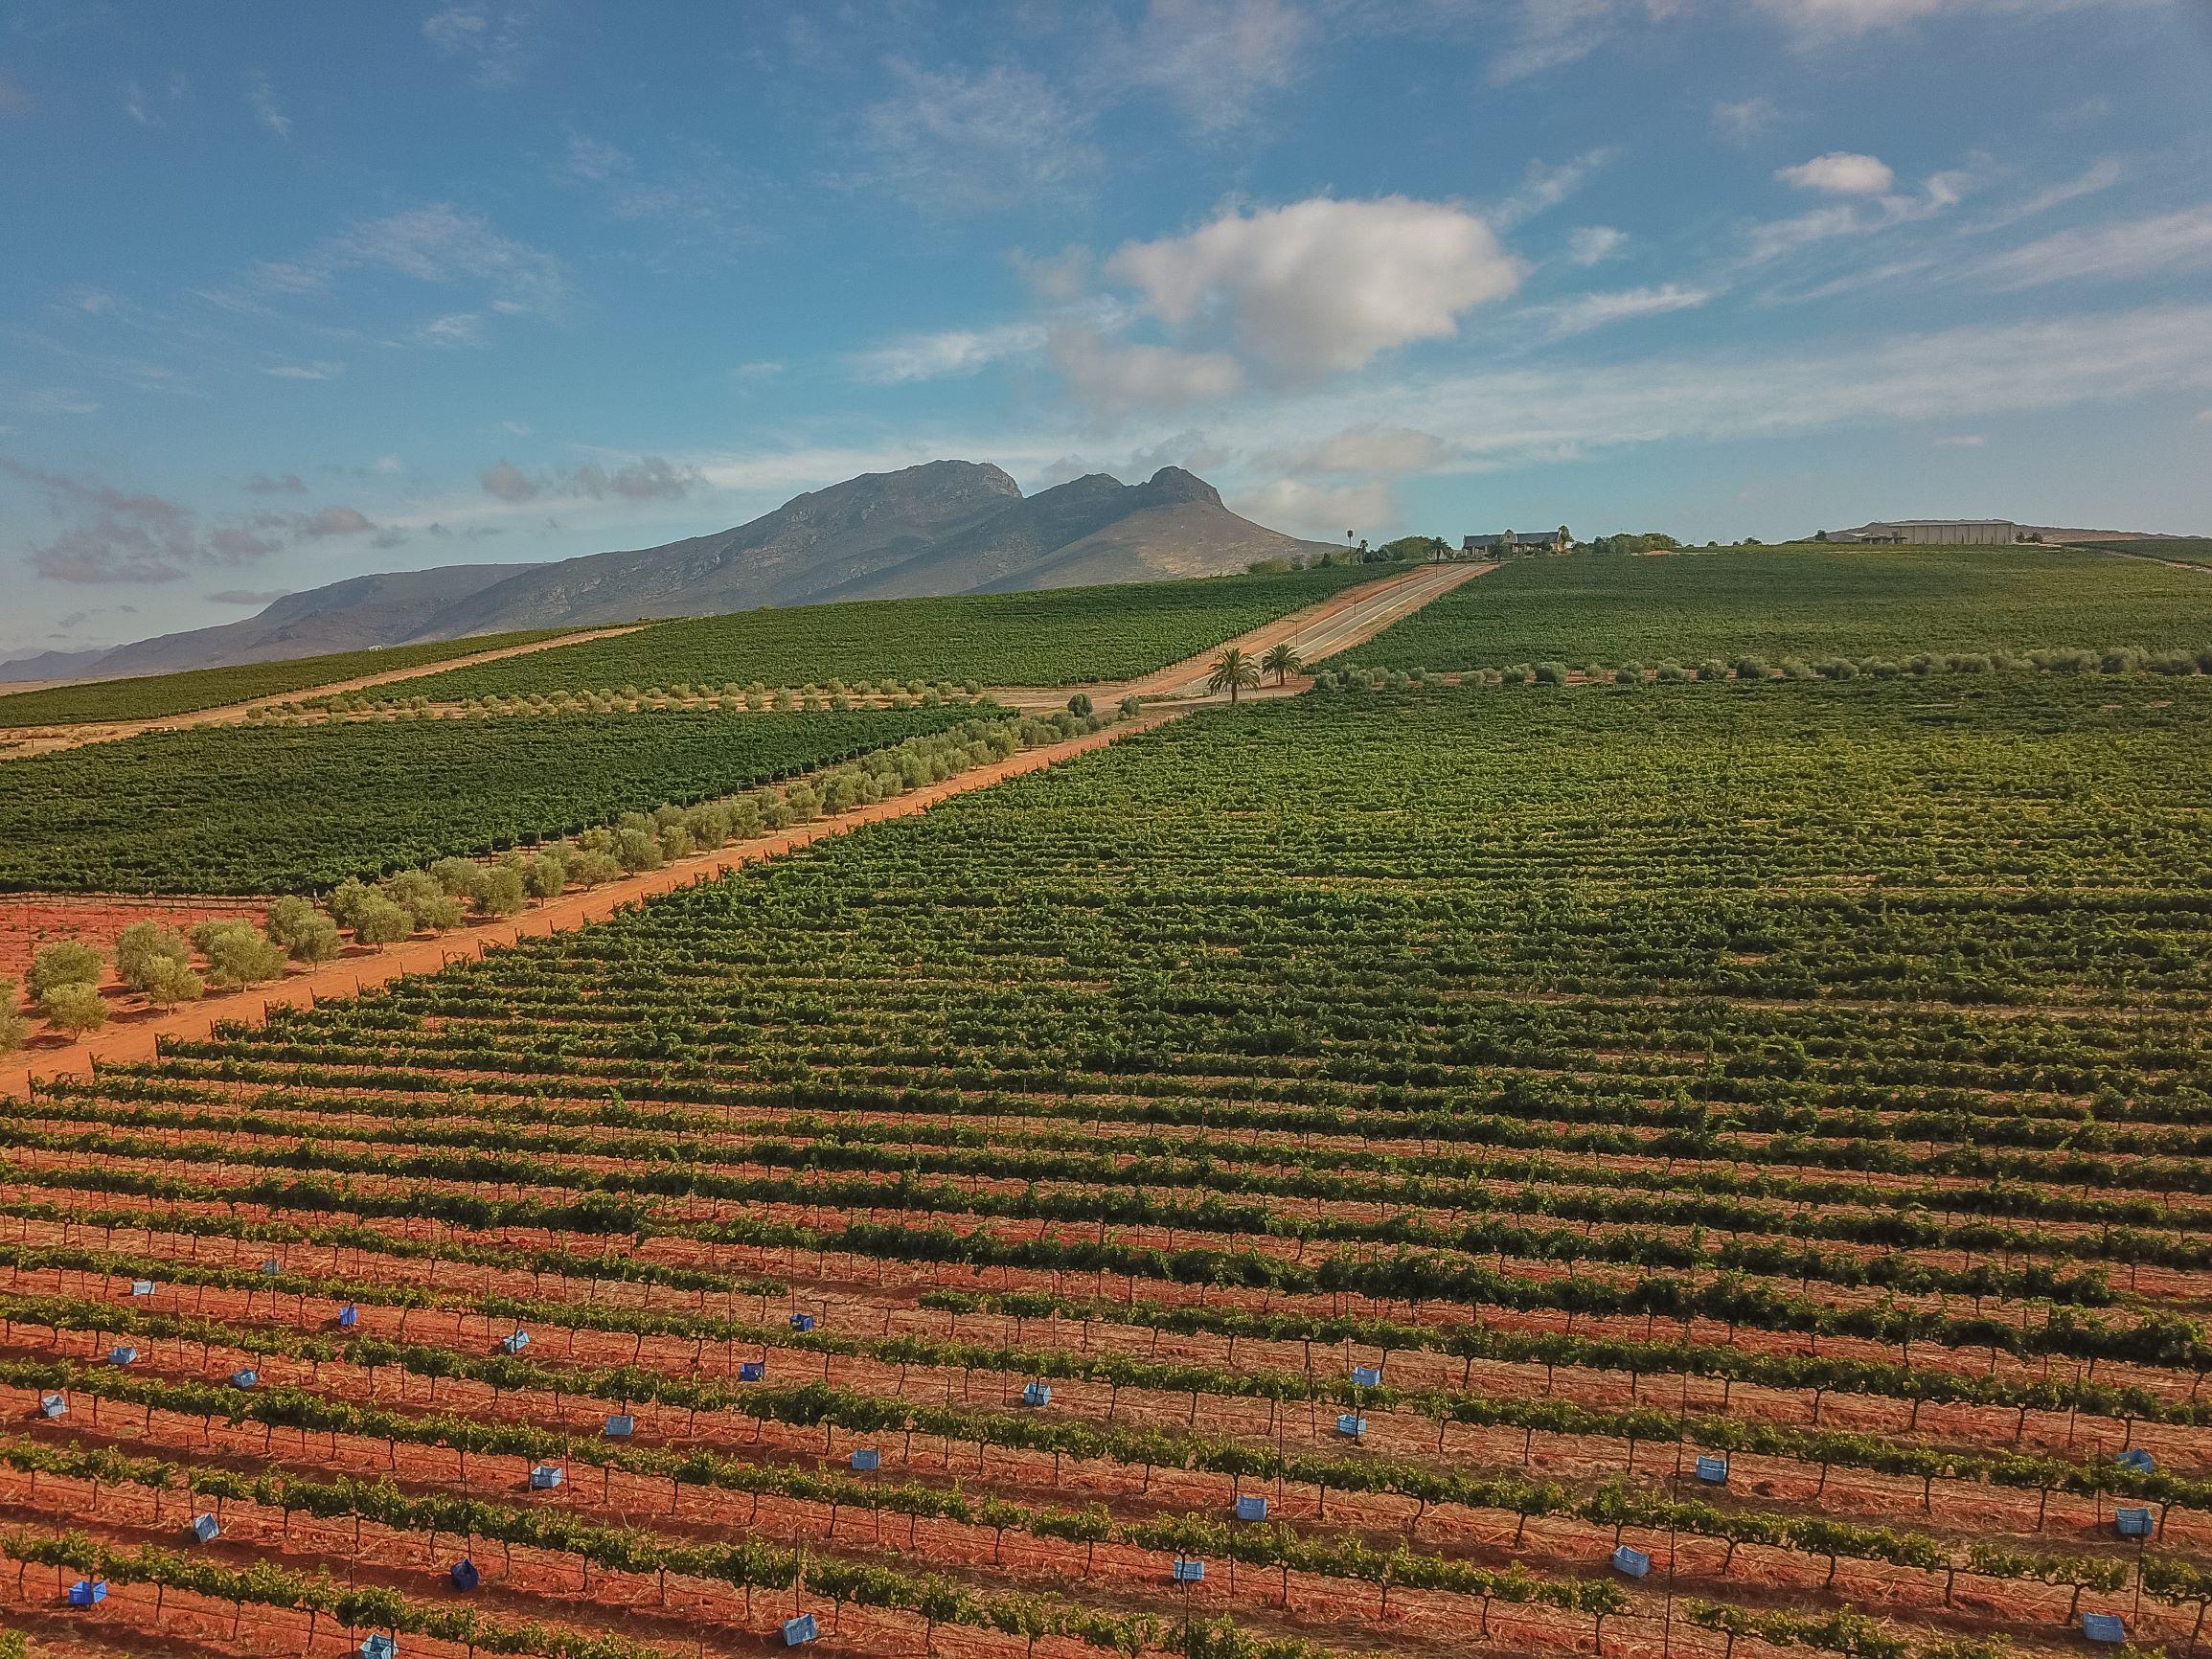 Org de Rac Harvest Expresses Essence of Organically Farmed Grapes photo